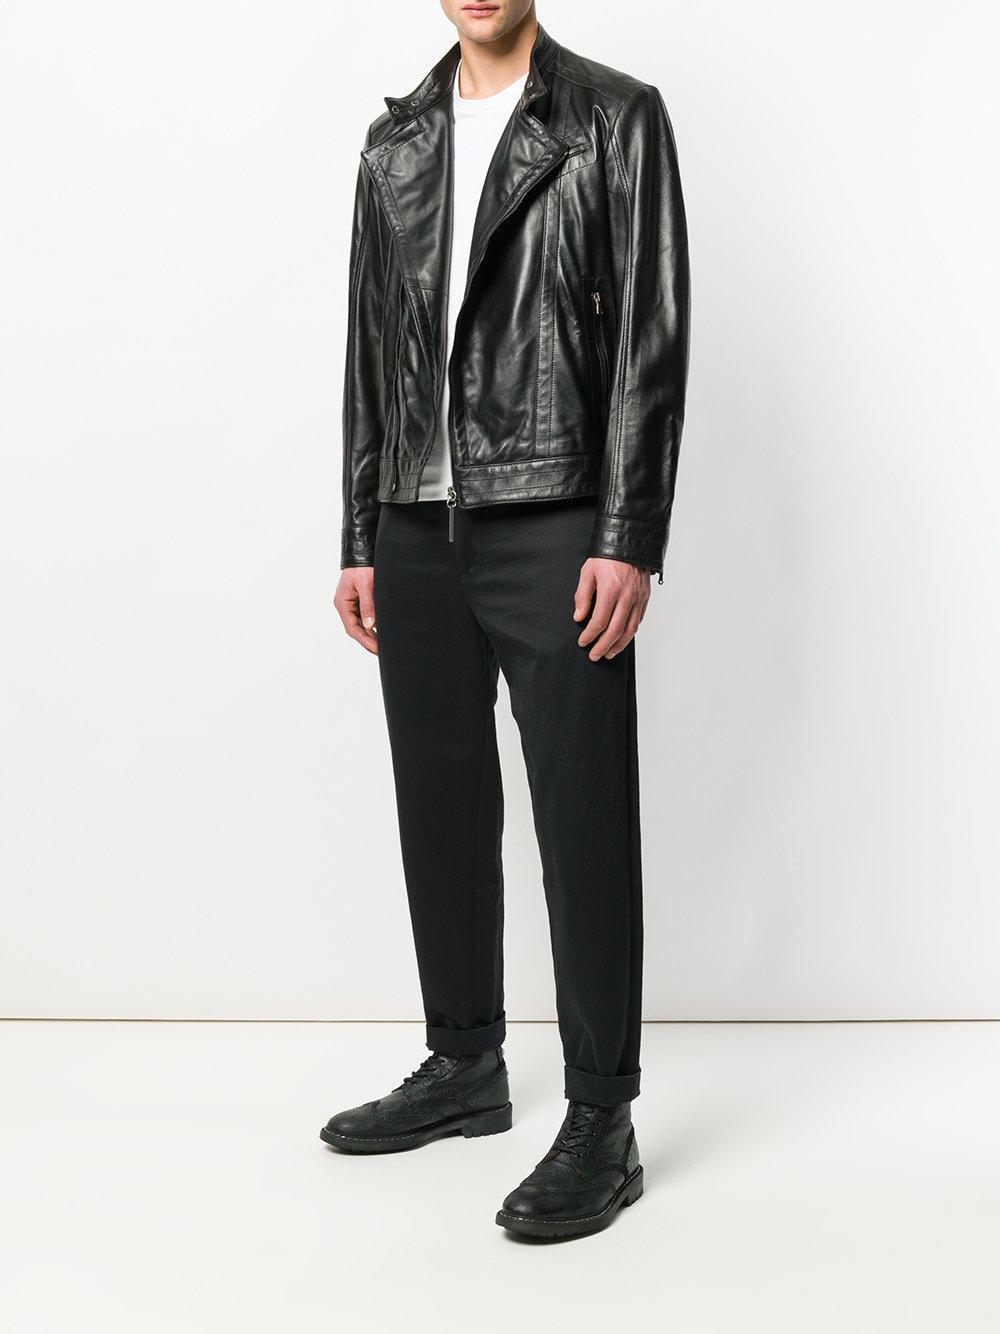 Dirk Bikkembergs Leather Biker Jacket in Black for Men